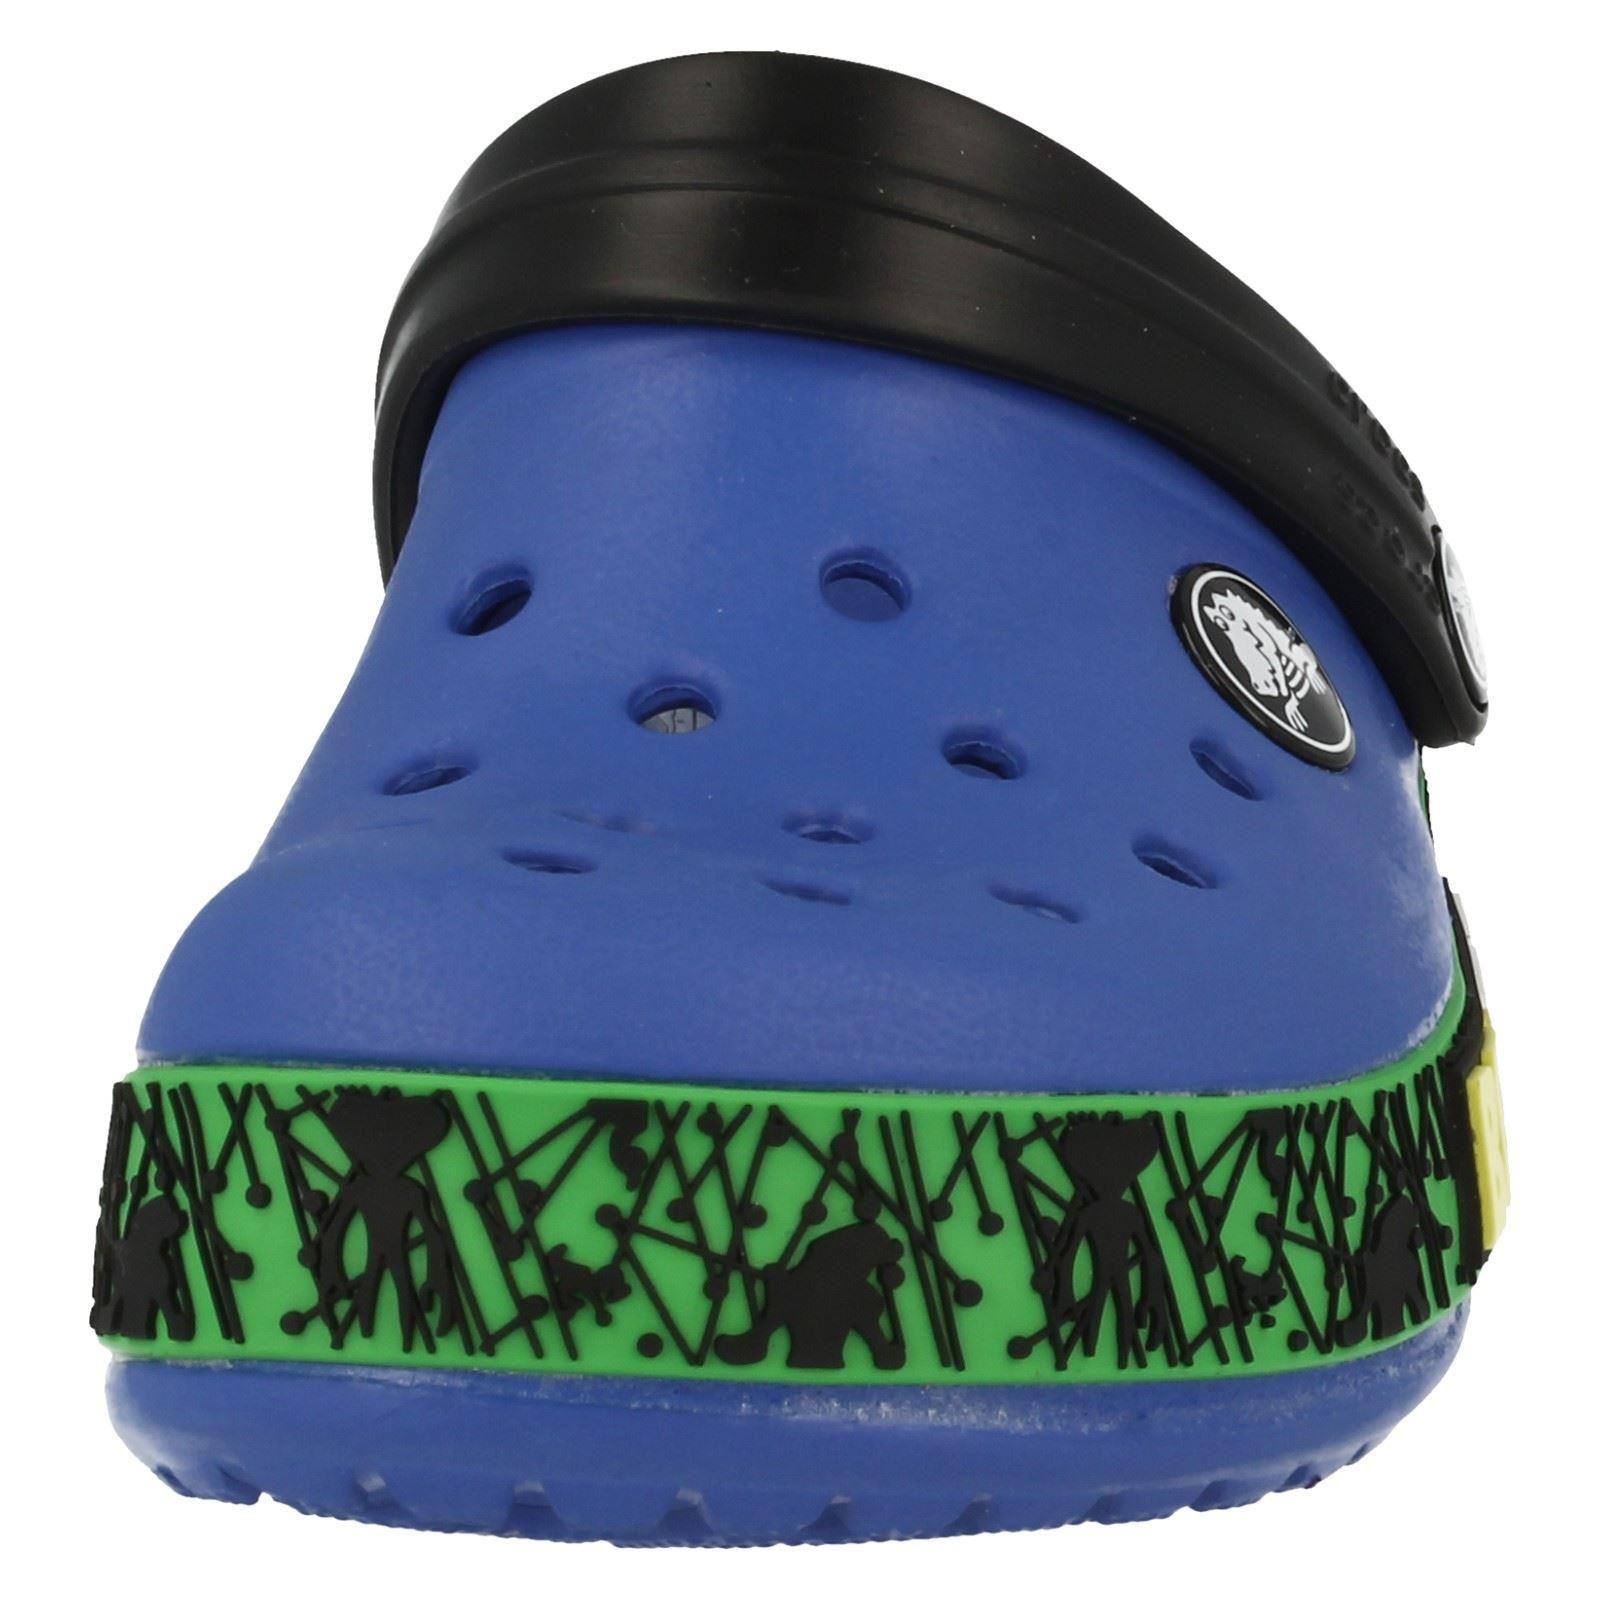 Boys Ben 10 Croc Mule Sandals /'Crocband Ben 10 Kids/'